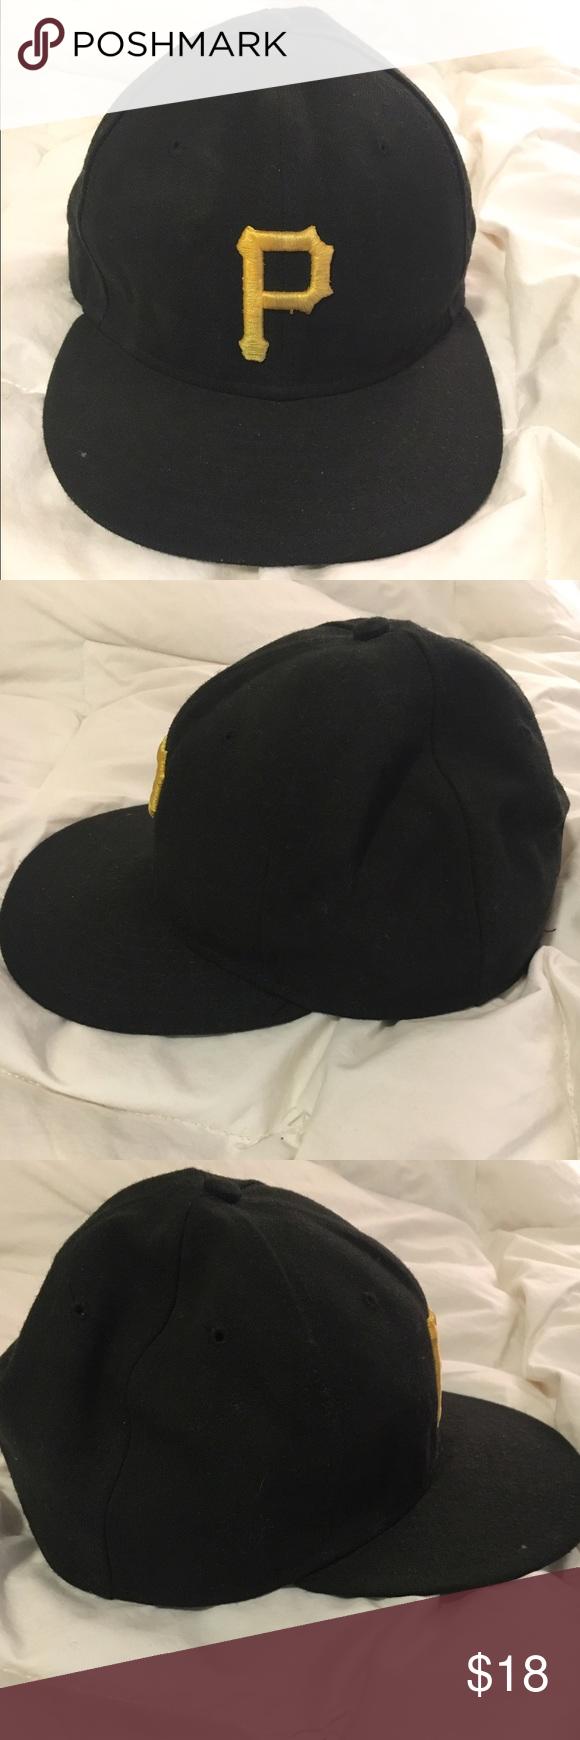 Host Pick Mlb Pirates Hat Pirate Hats Hats Mlb Pirates